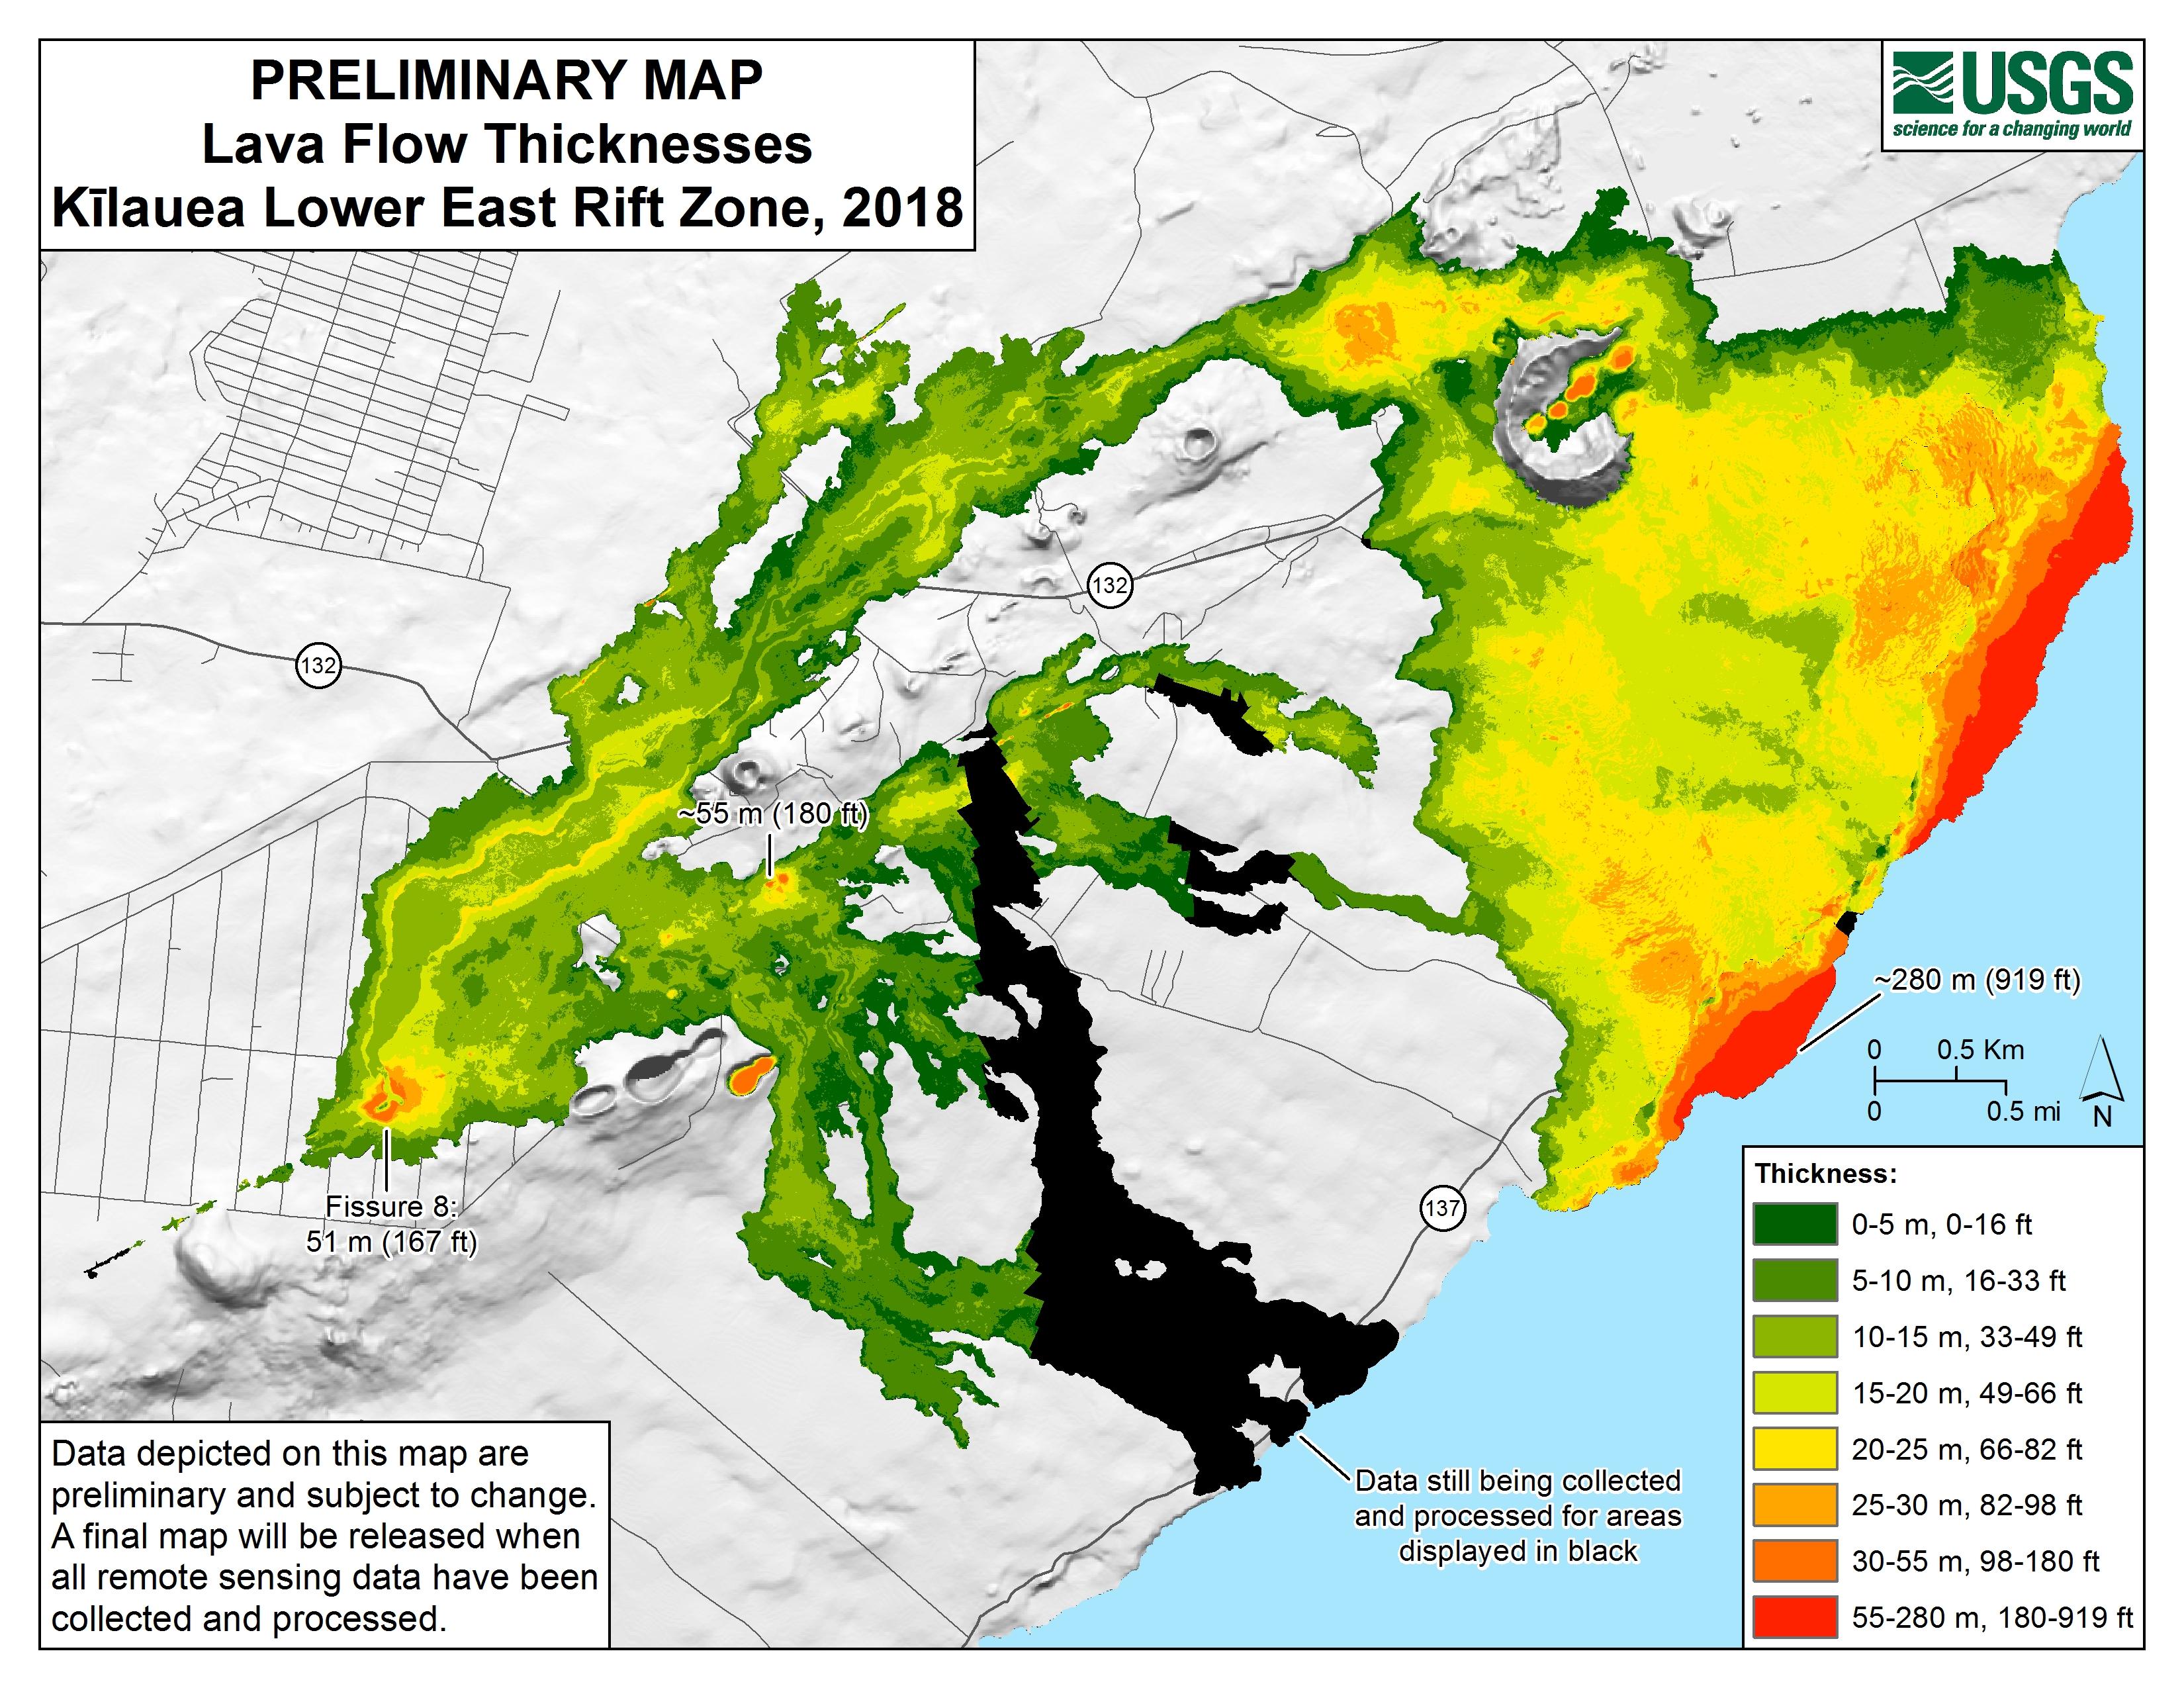 USGS: Volcano Hazards Program HVO Kilauea